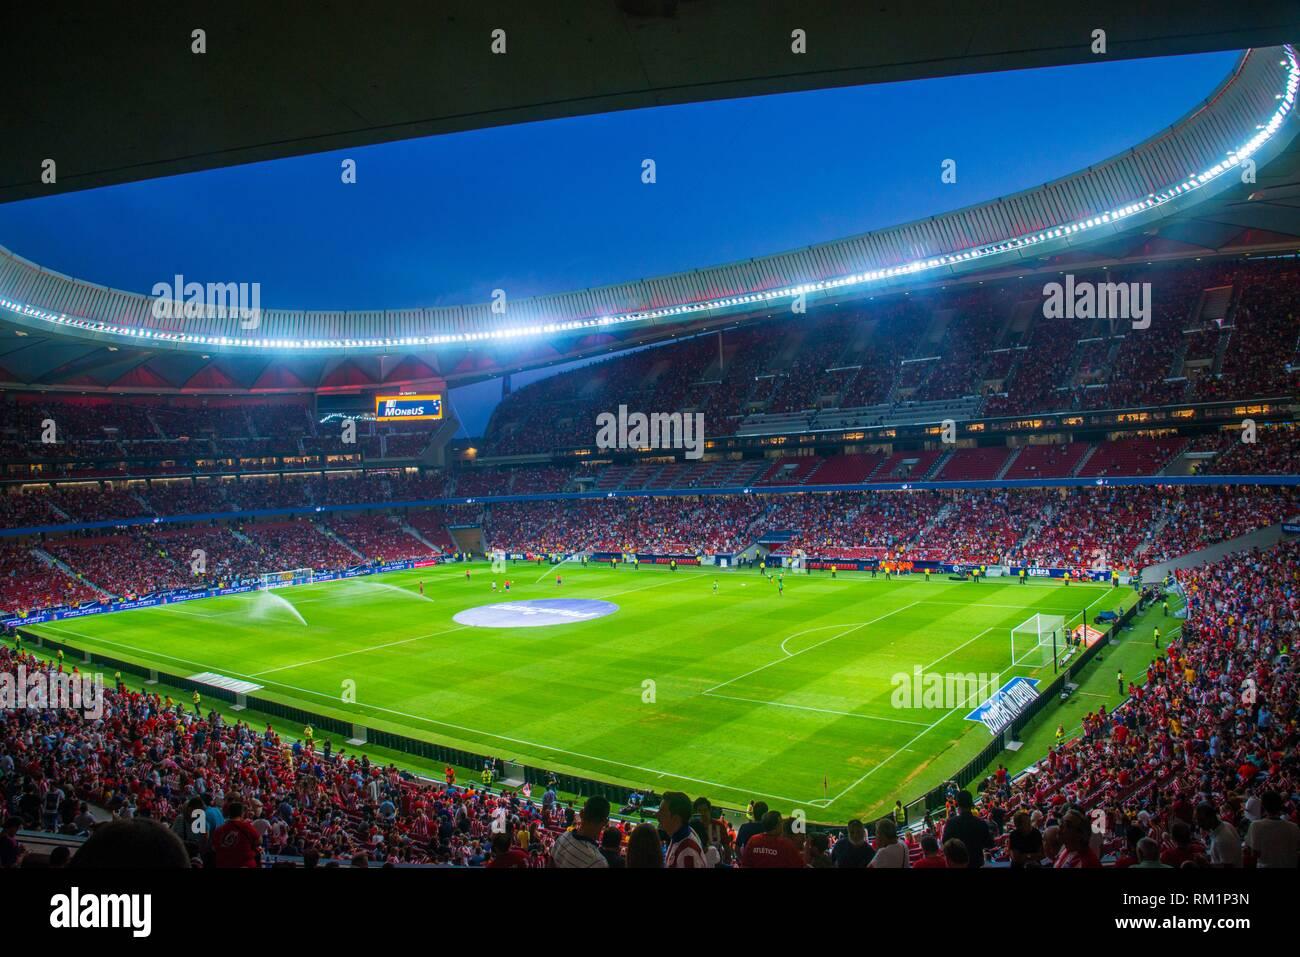 Wanda Metropolitano Stadium before a football match. Madrid, Spain. - Stock Image